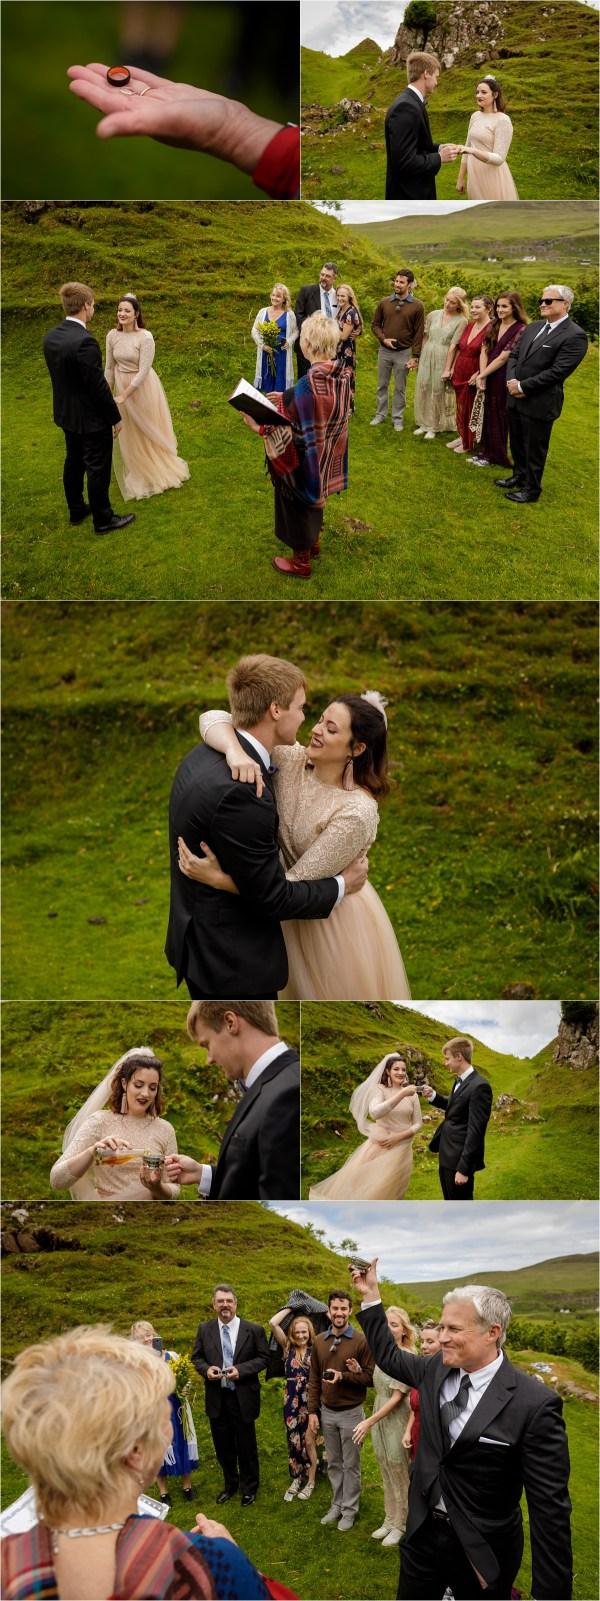 An emotional Isle of Skye intimate wedding ceremony by Lynne Kennedy Photography